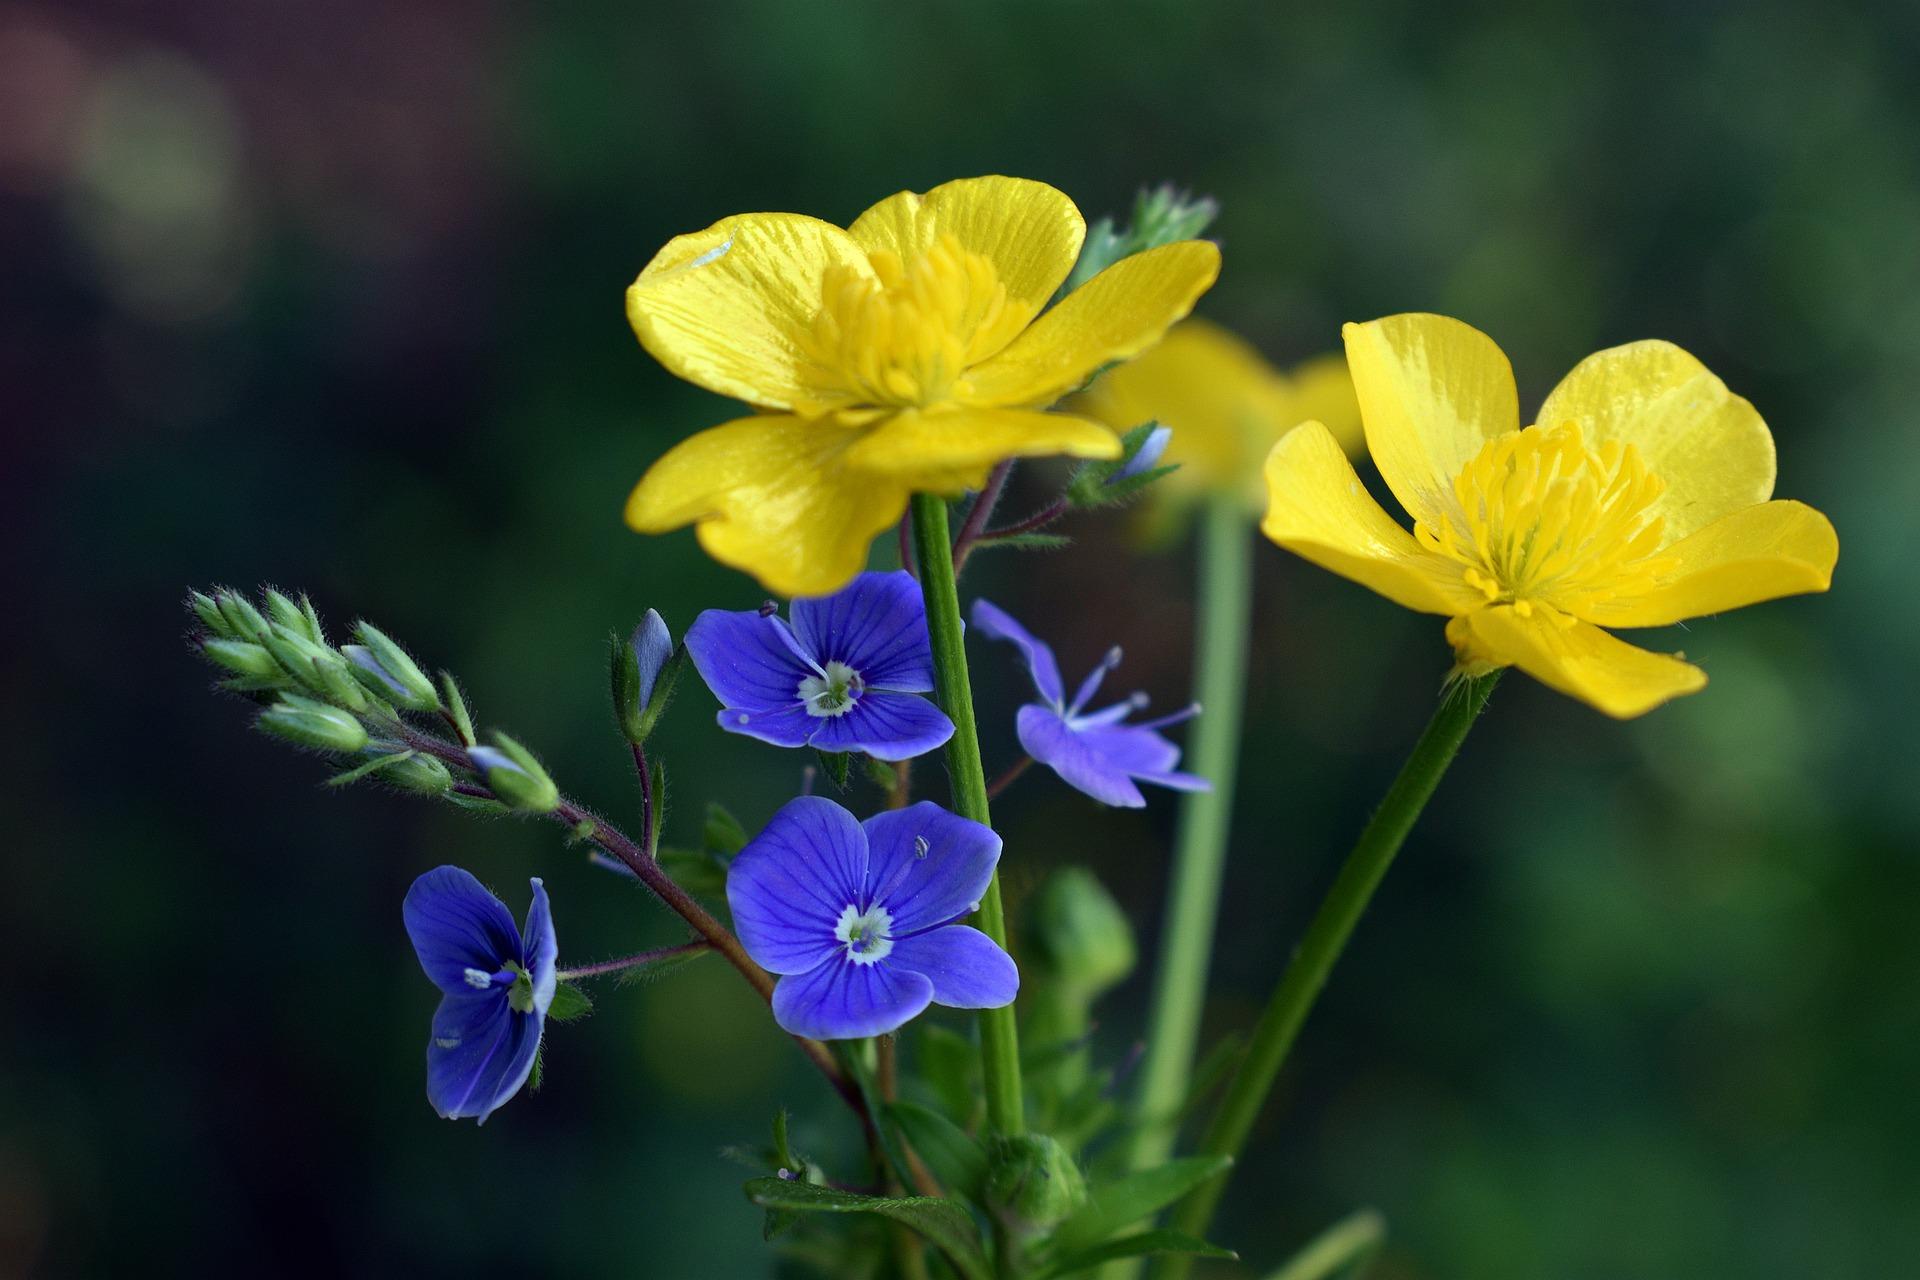 flowers-5291379_1920